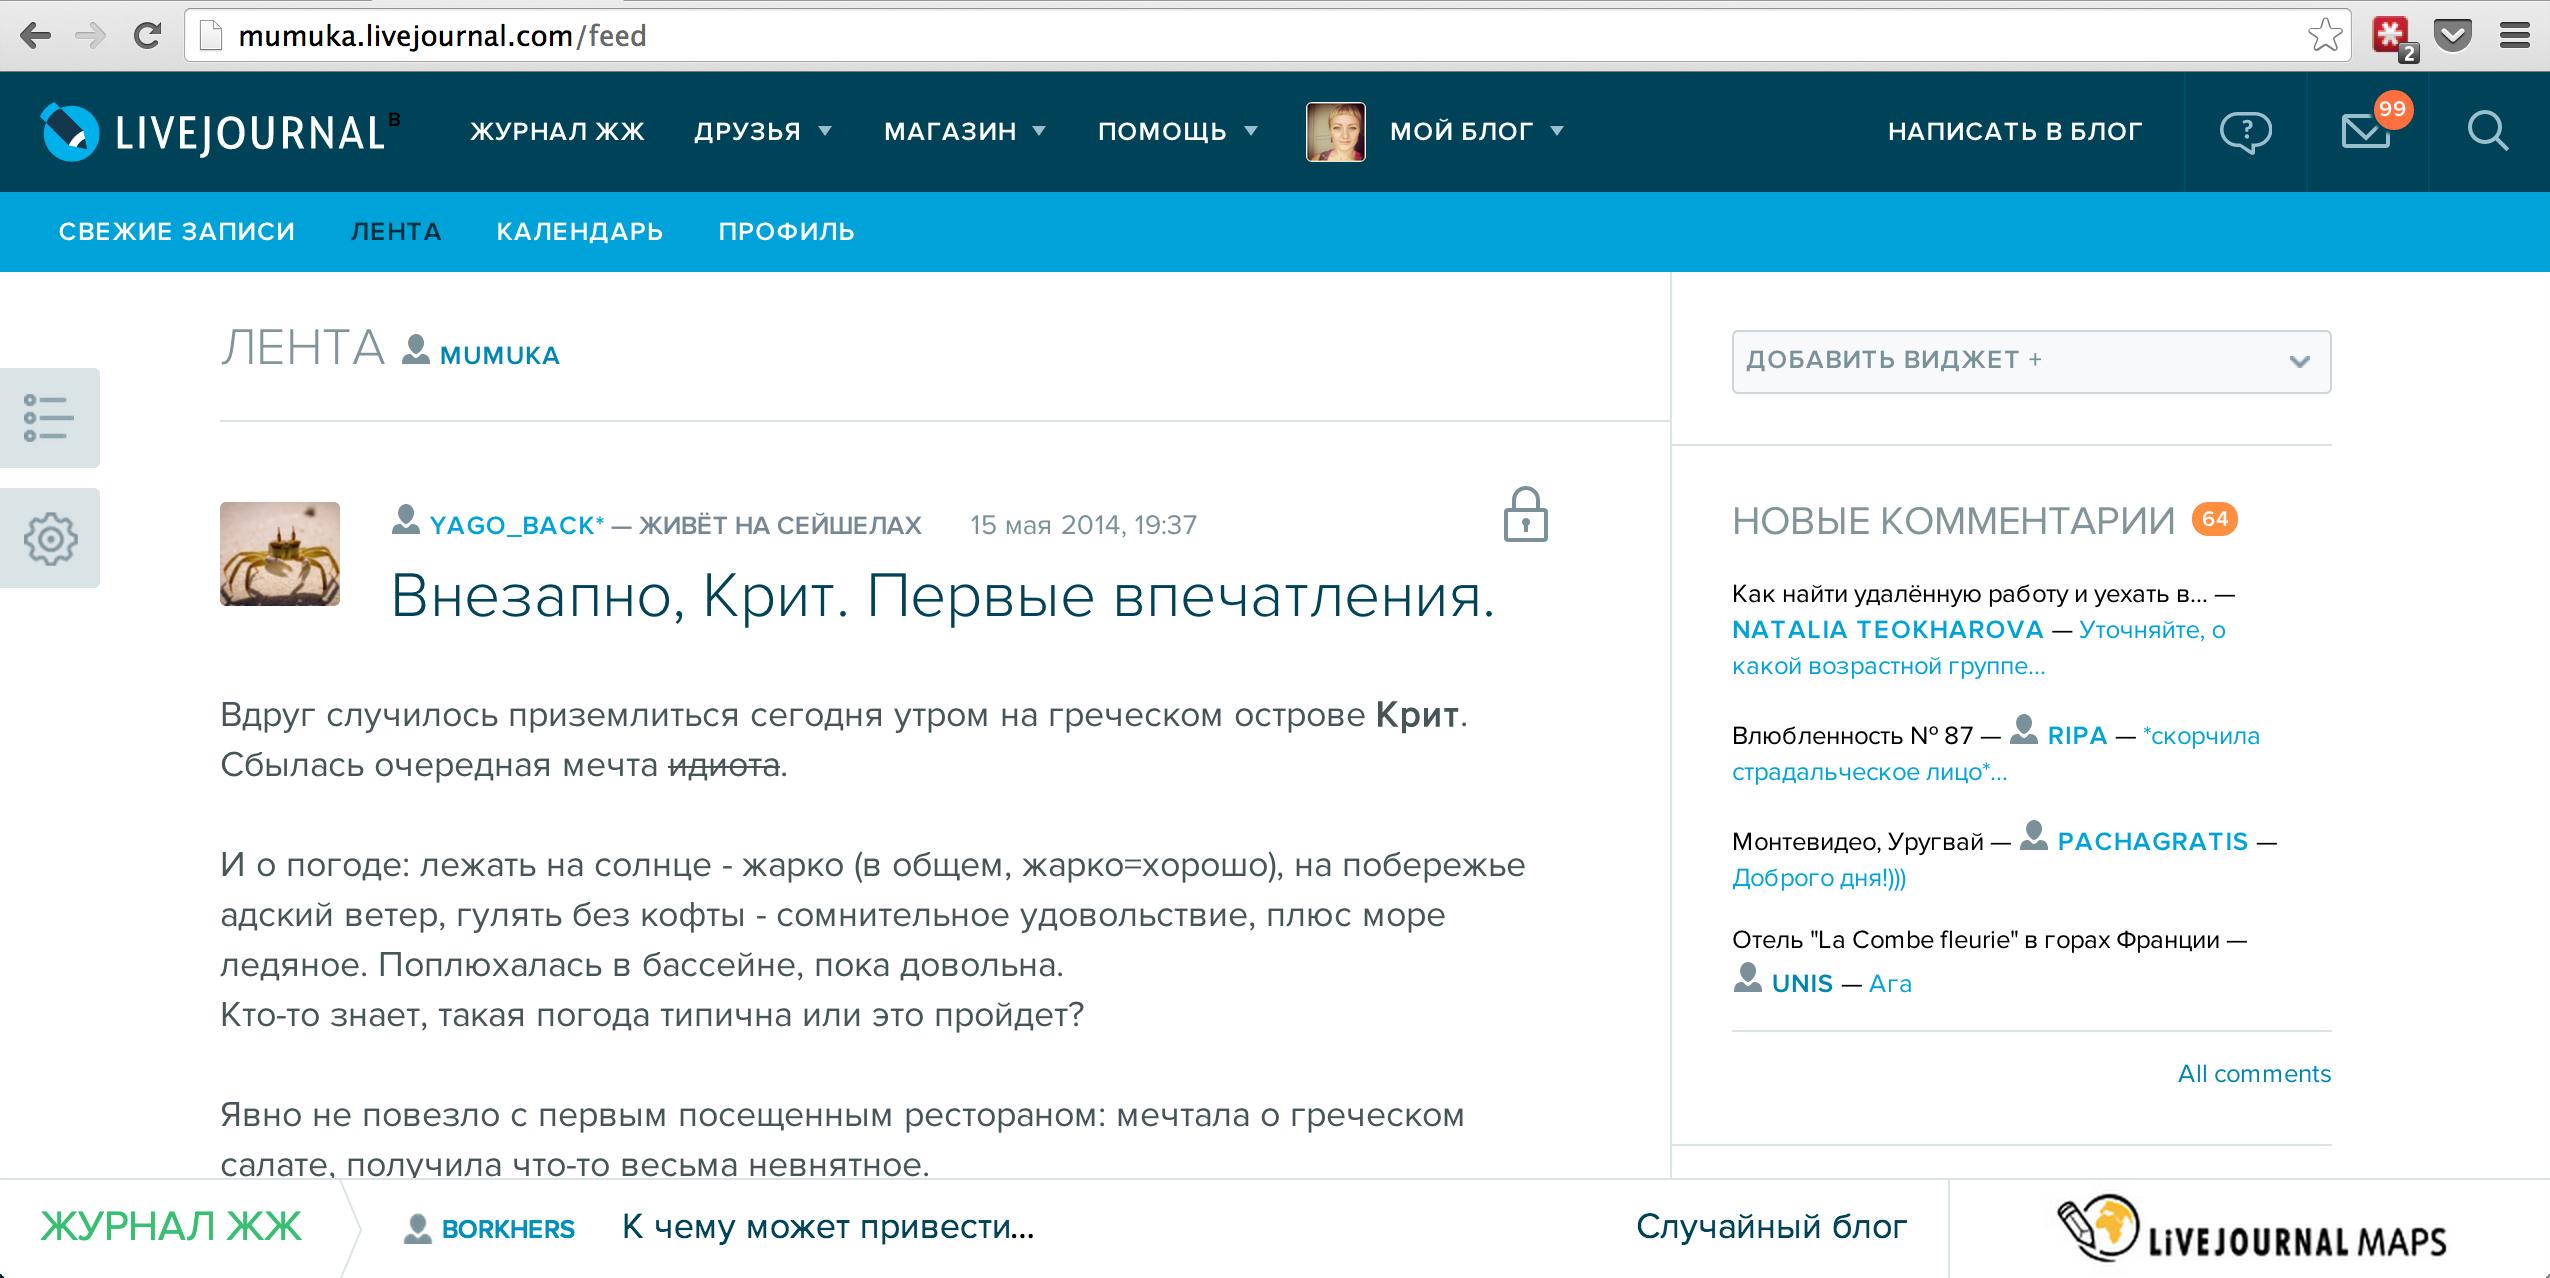 Снимок экрана 2014-05-15 в 19.48.06